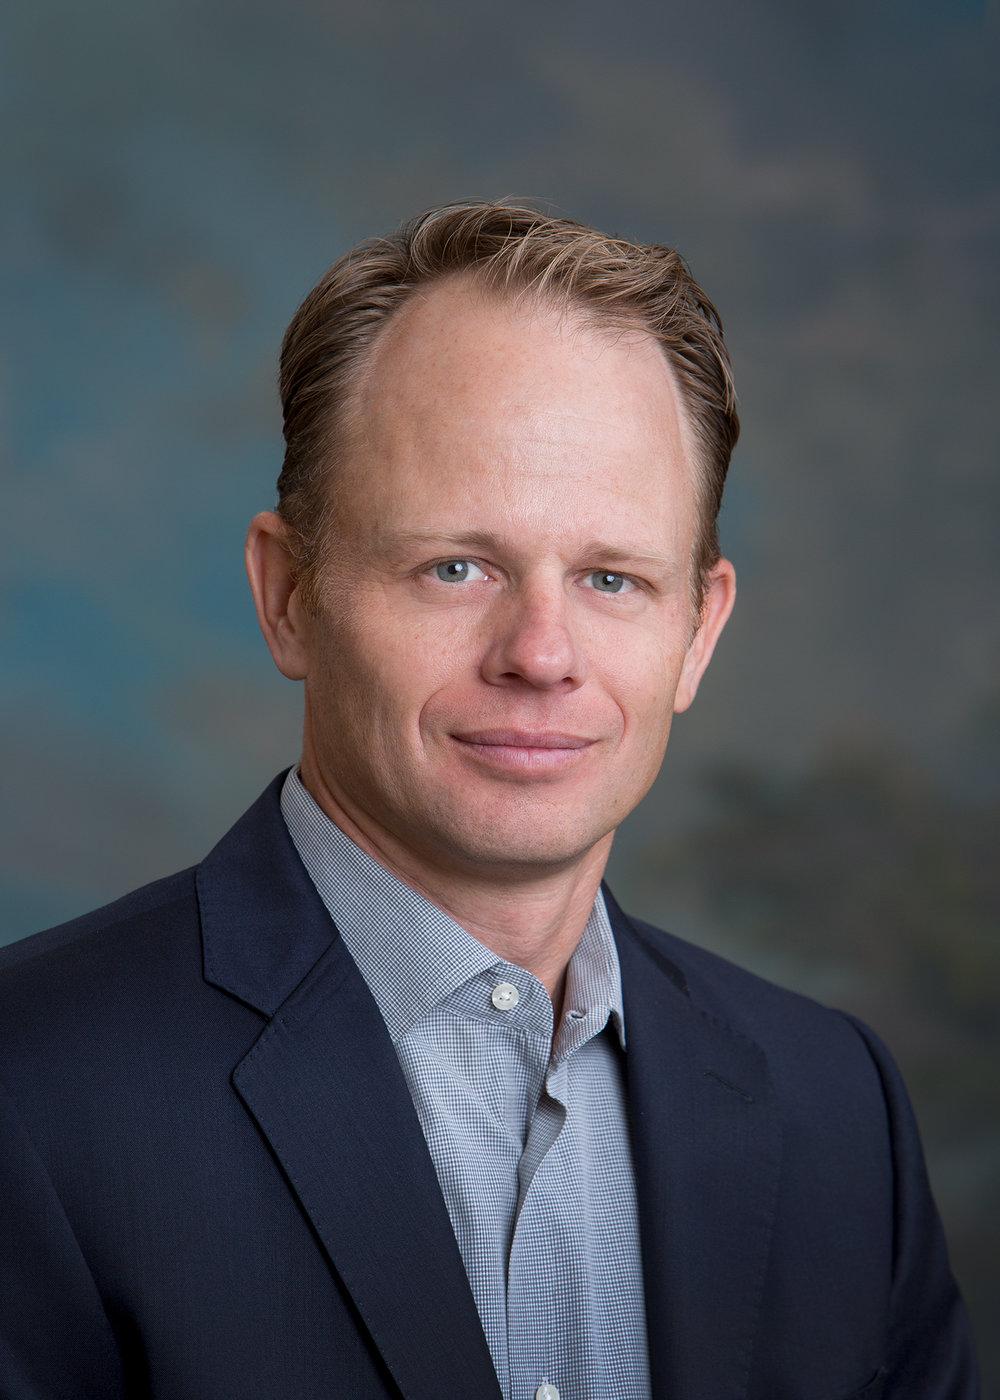 JAKE PARSONS, CFP®  Principal, CEO